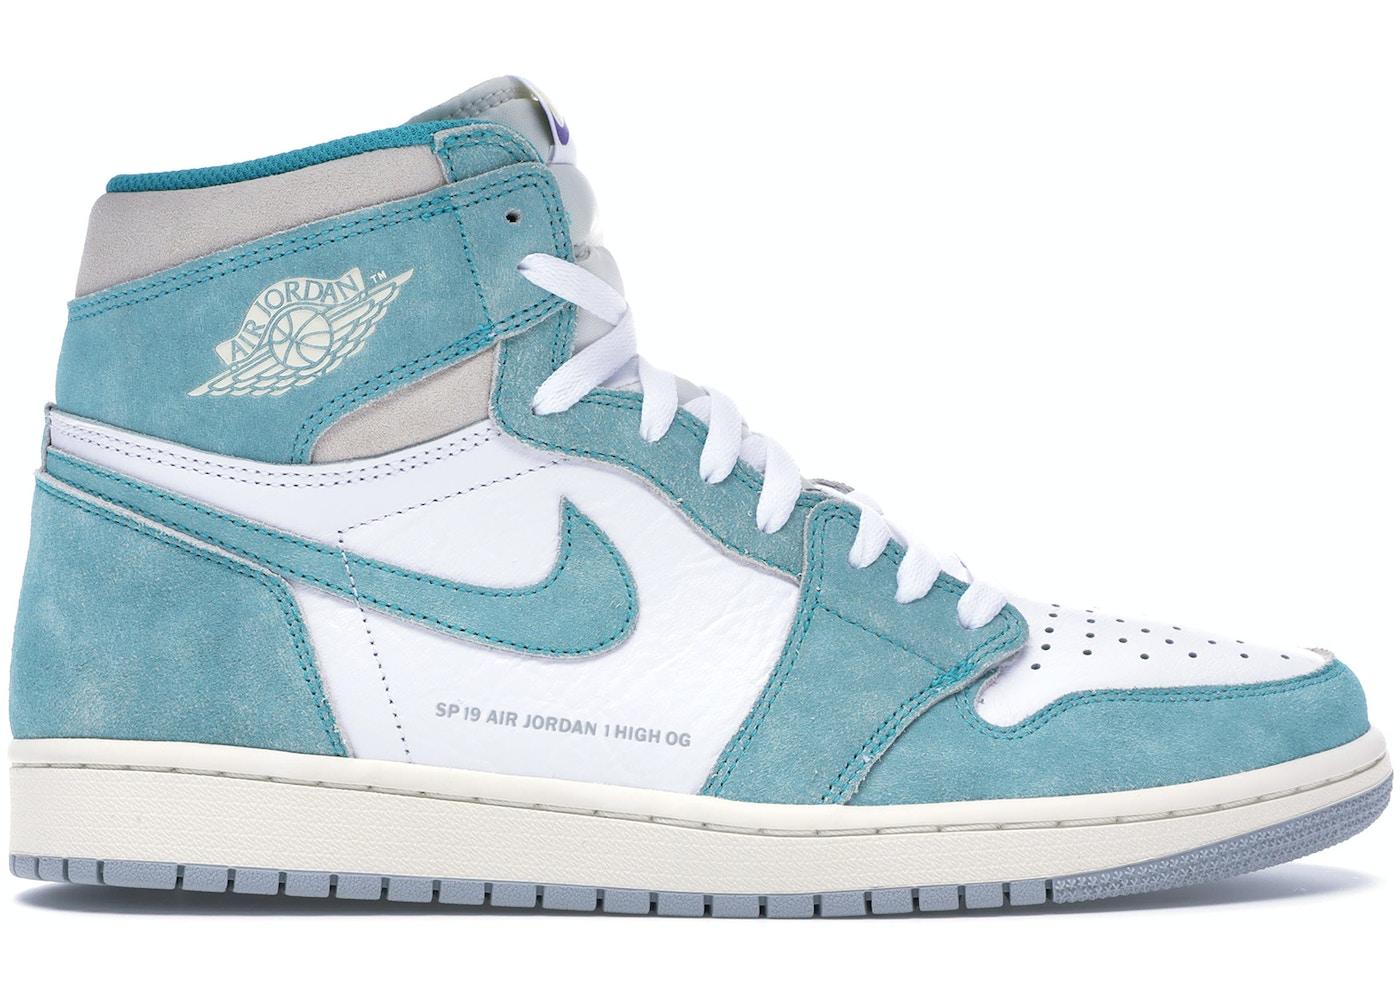 new style 74de0 8d3a6 Buy Air Jordan 1 Size 9 Shoes   Deadstock Sneakers